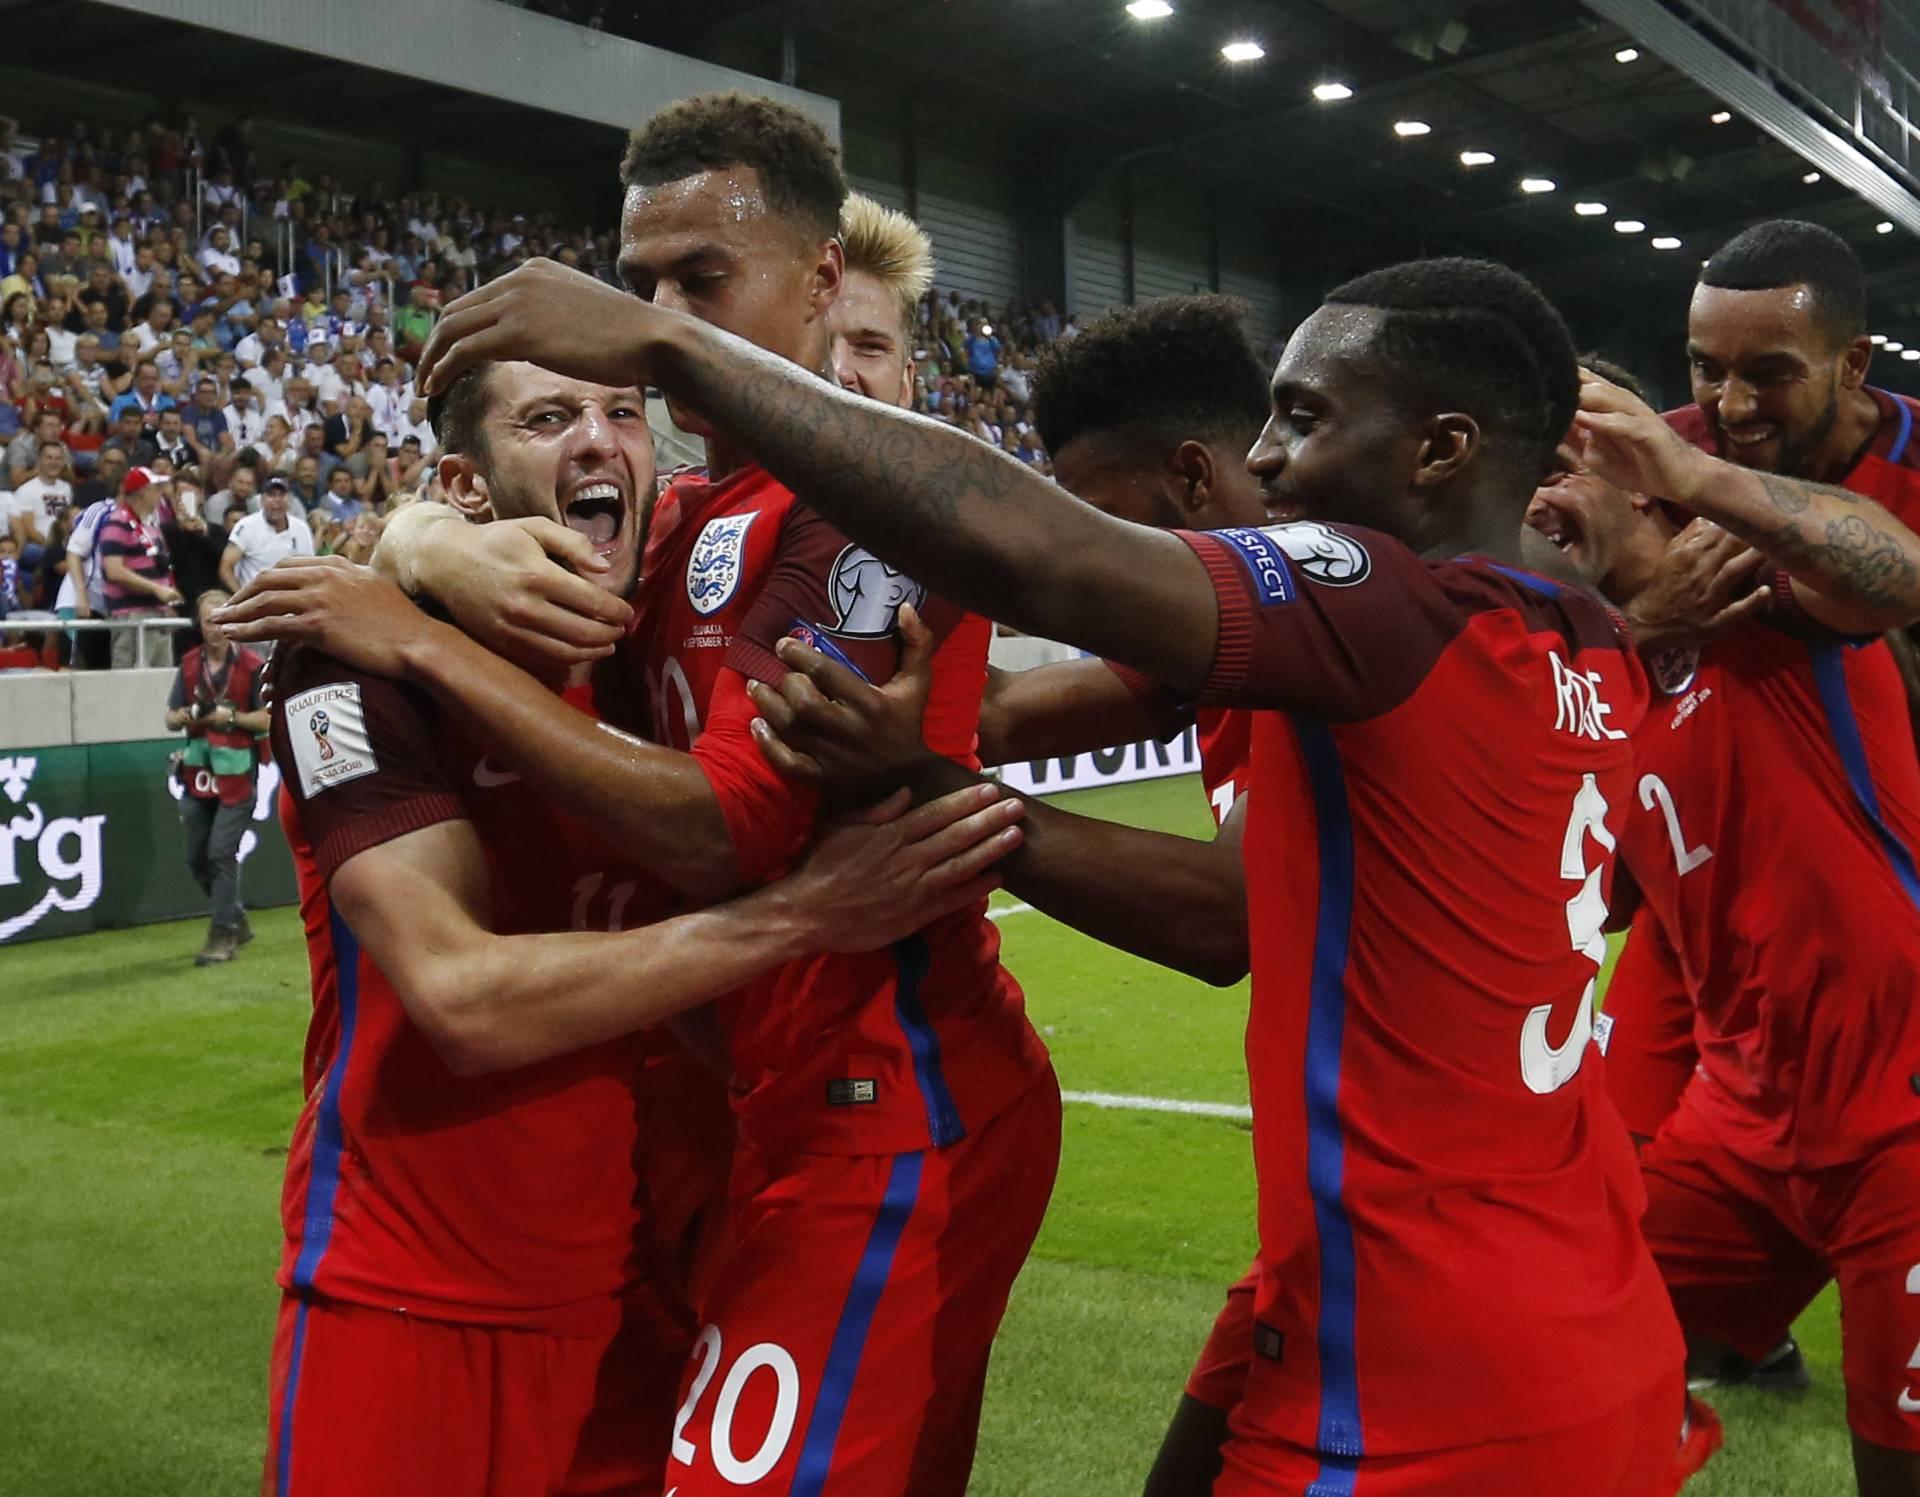 Slovakia v England - 2018 World Cup Qualifying European Zone - Group F